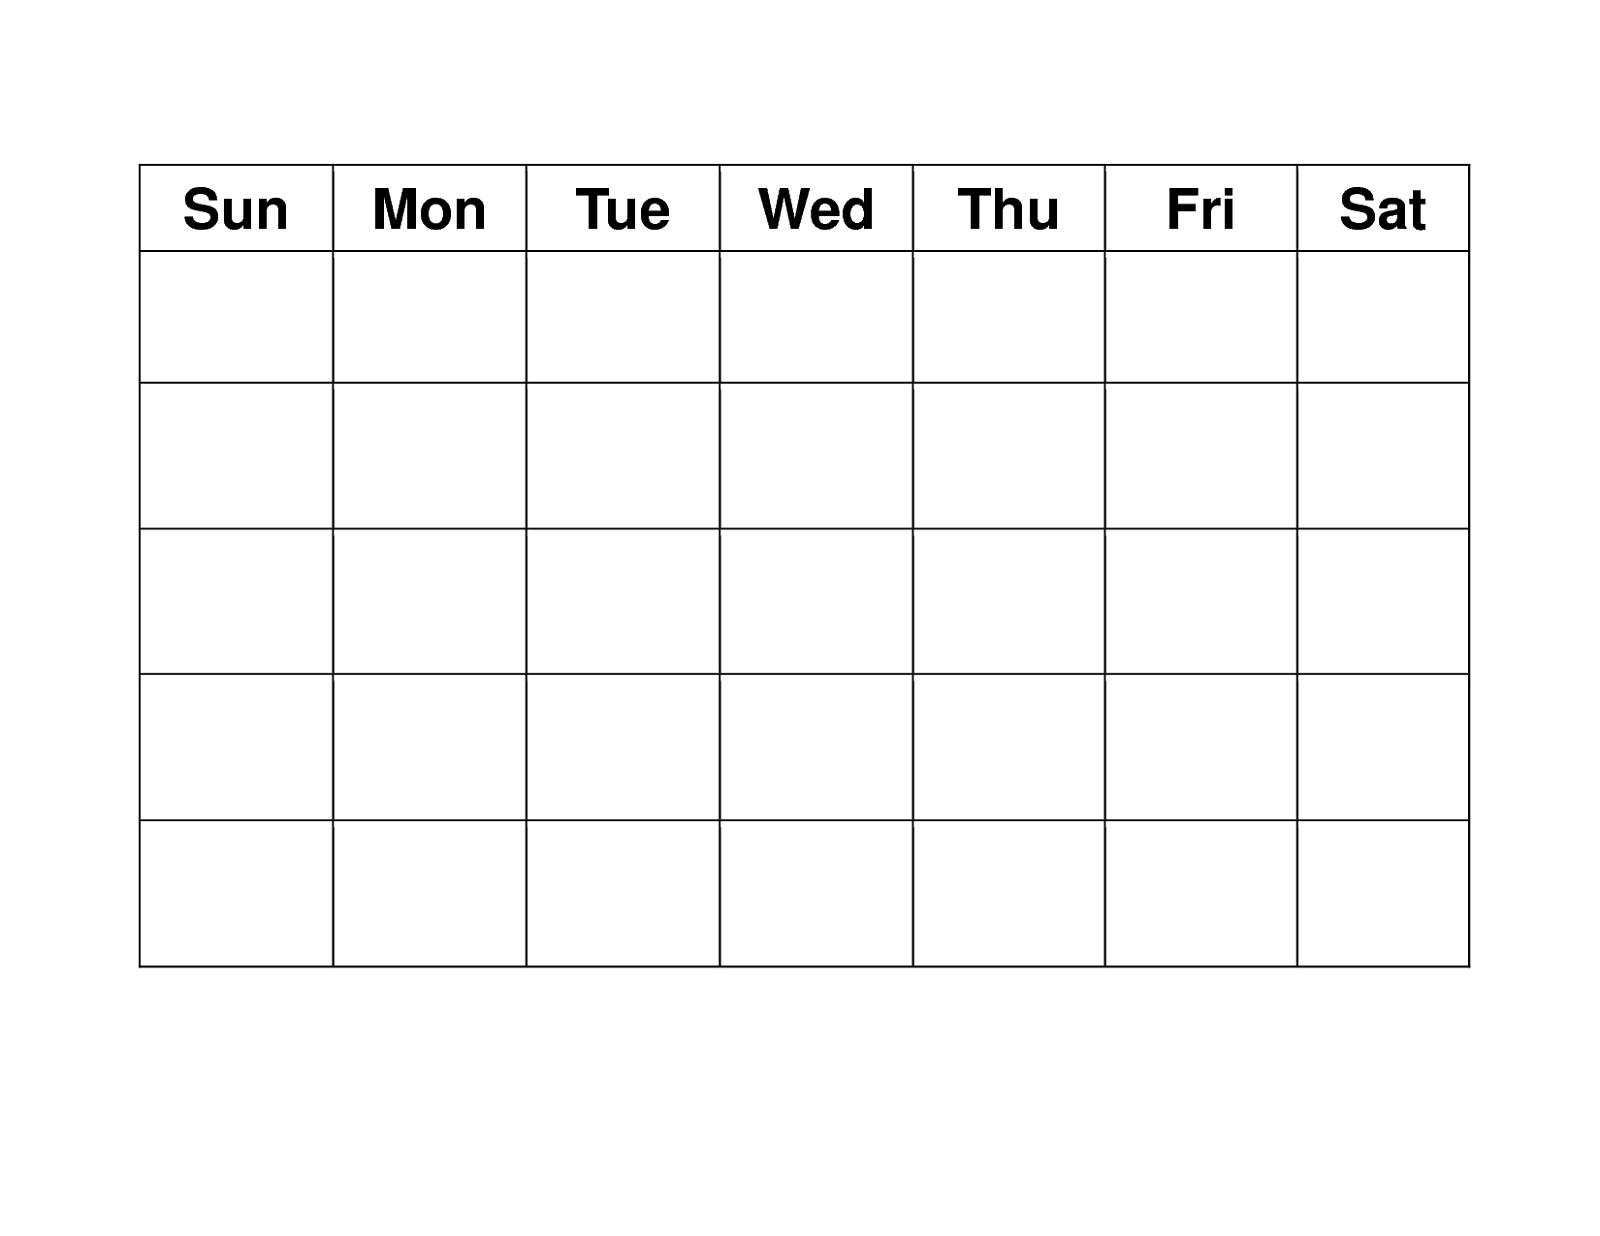 Blank Weekly Calendars Printable   Calendar Template Printable with regard to Week Calendar Blank With Time Slots